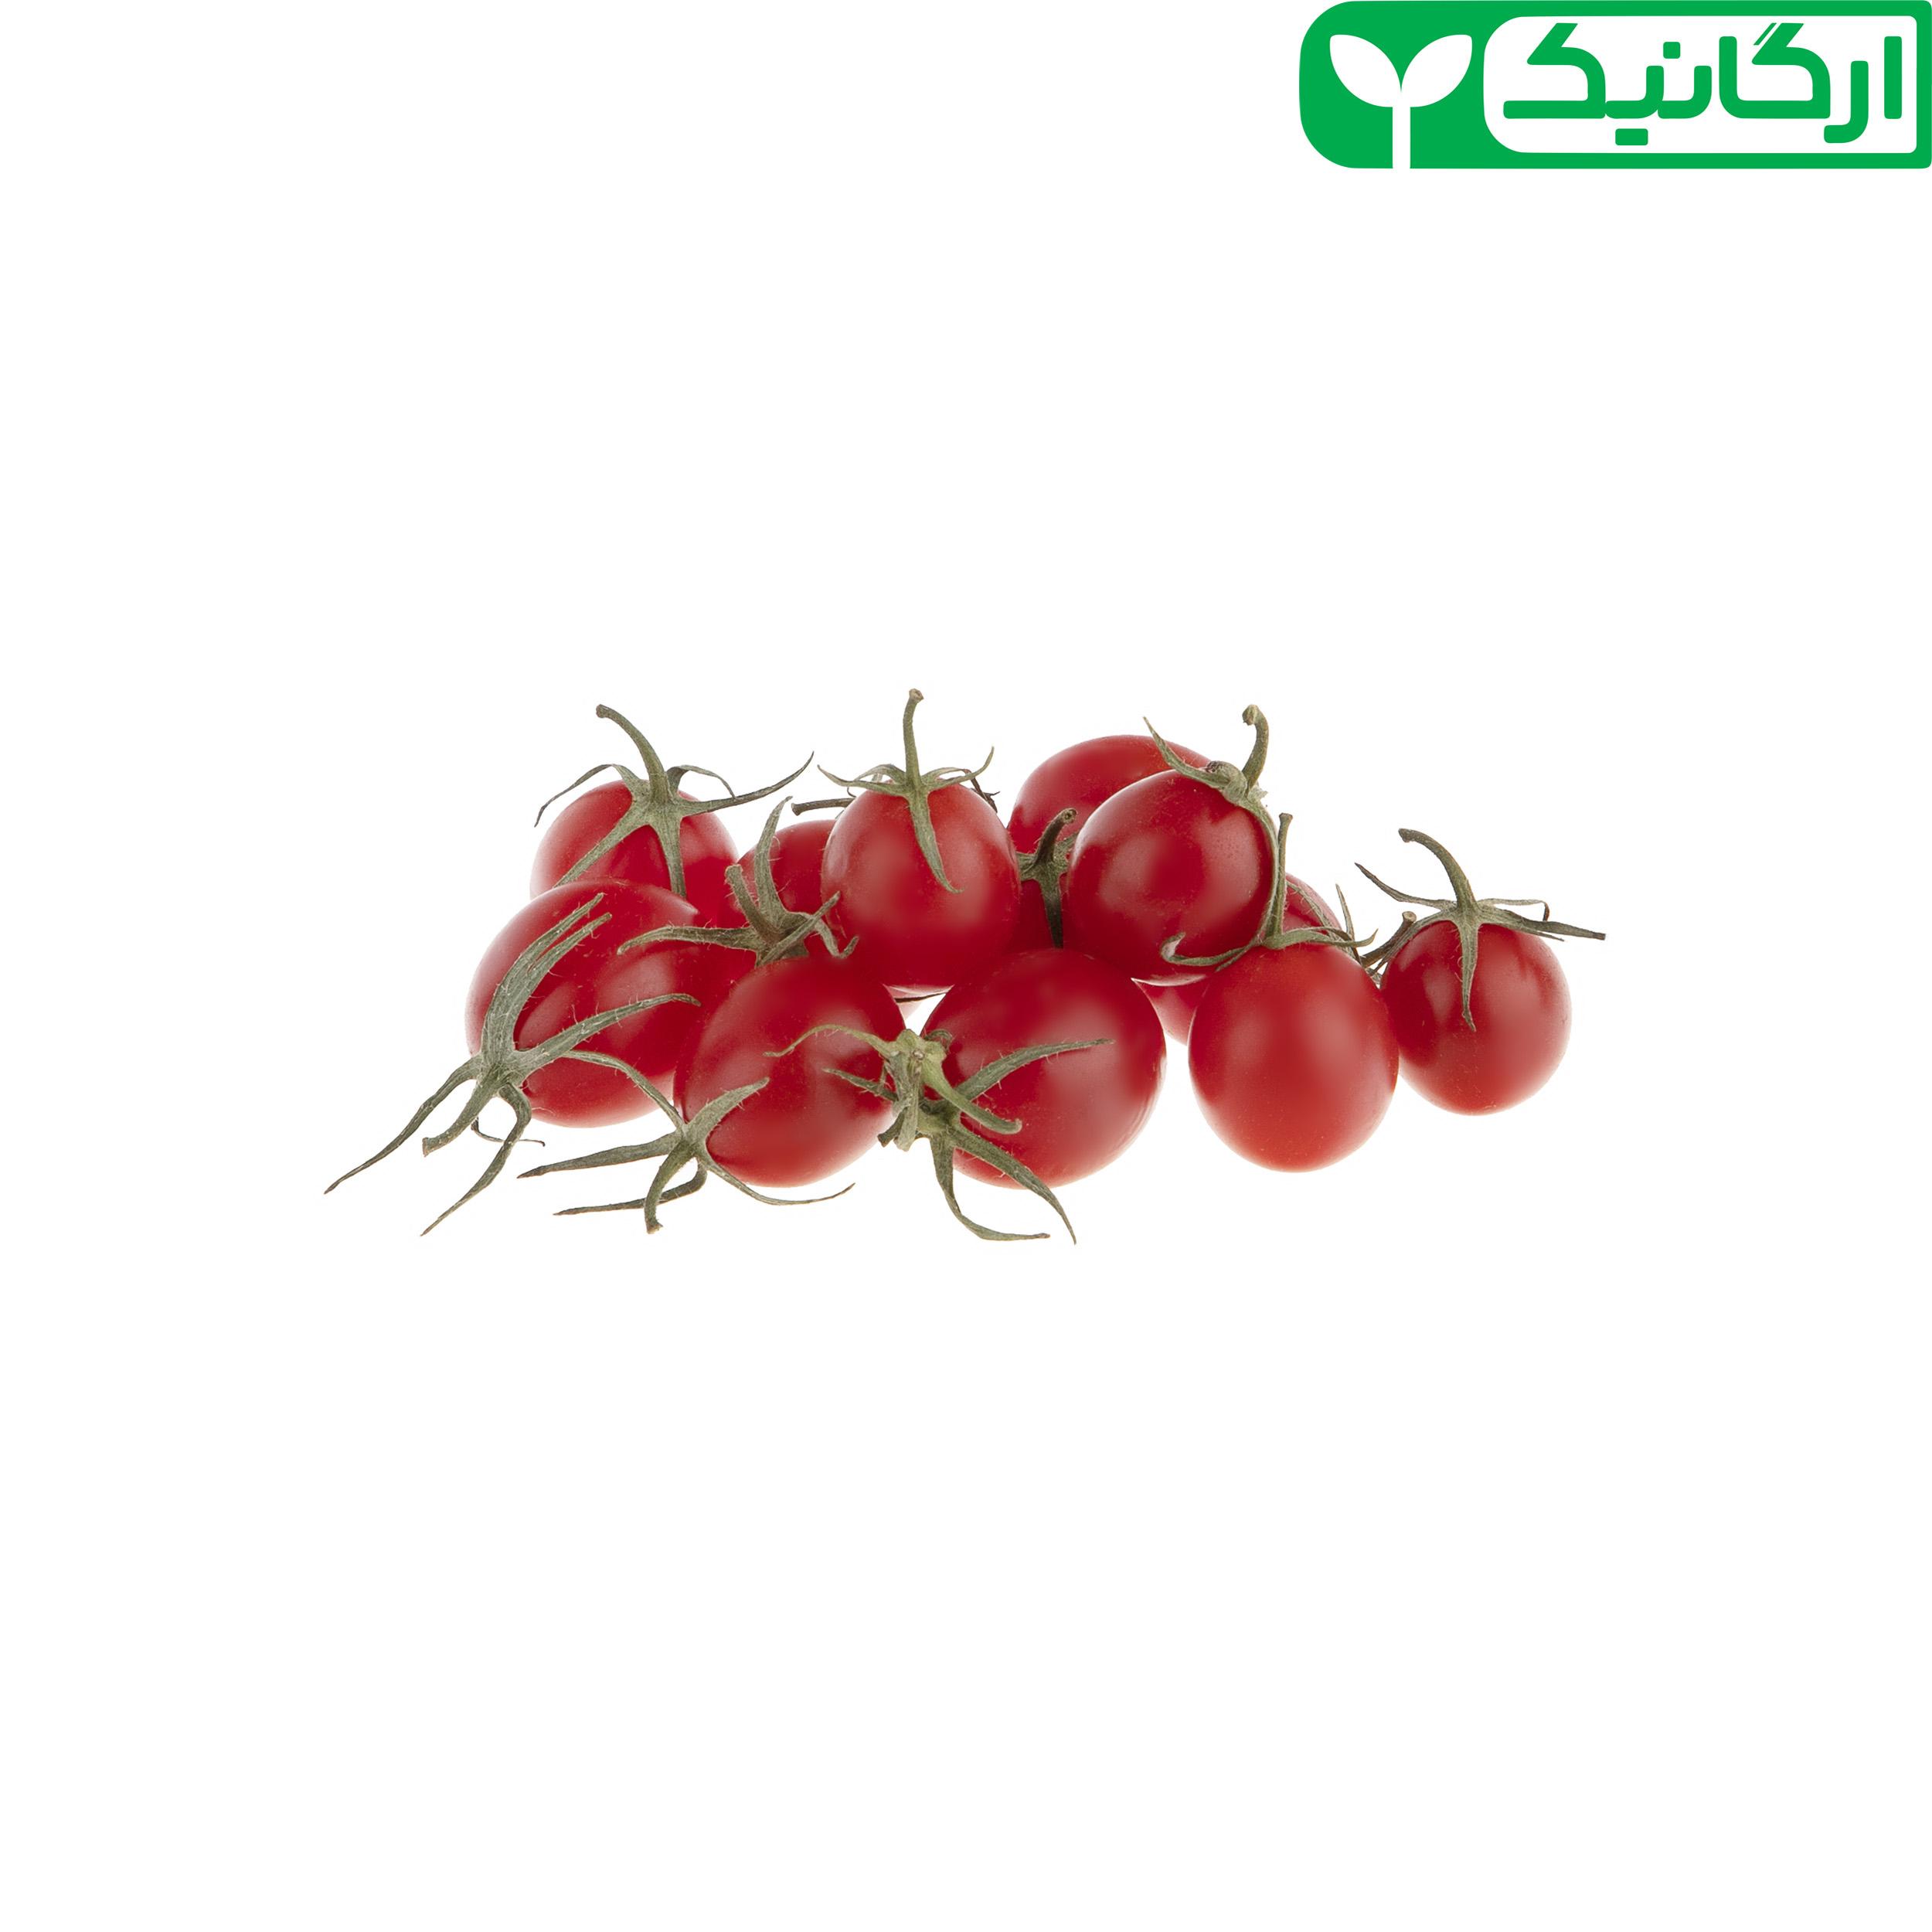 گوجه فرنگی زيتوني ارگانیک رضوانی - 500 گرم